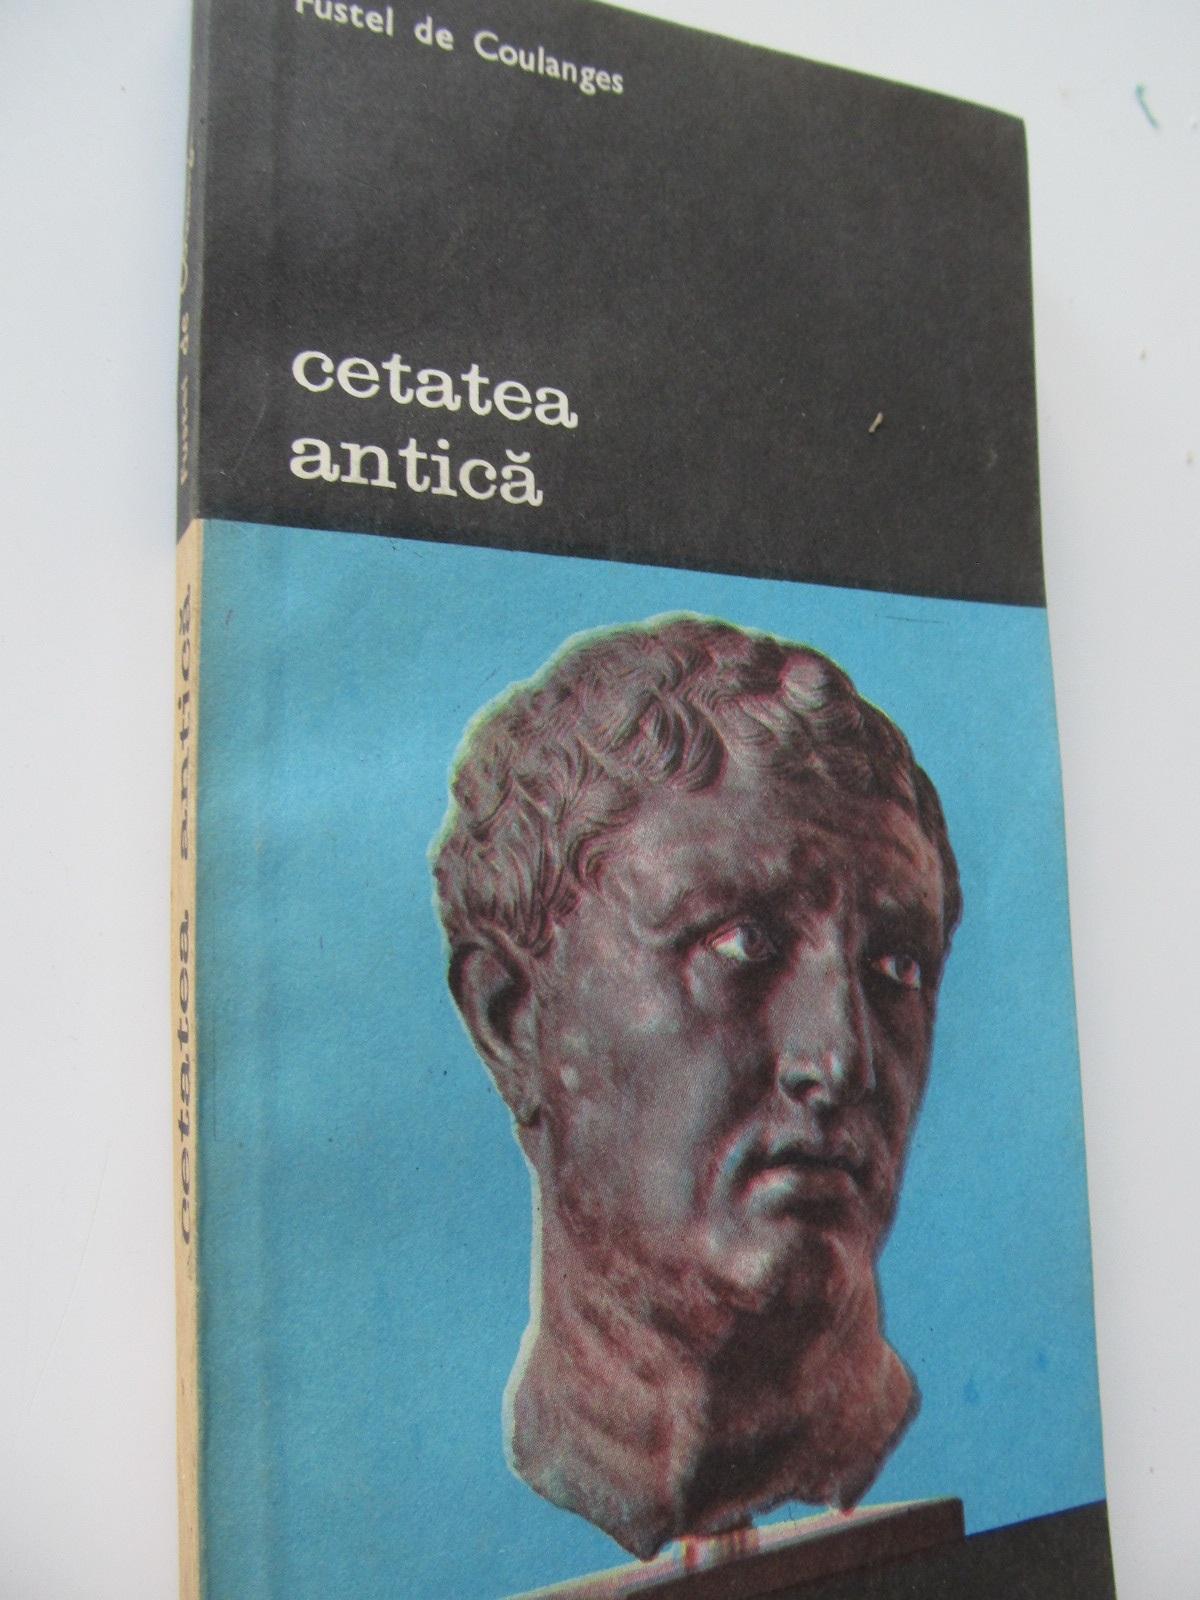 Carte Cetatea antica (vol. II) - Fustel de Coulanges